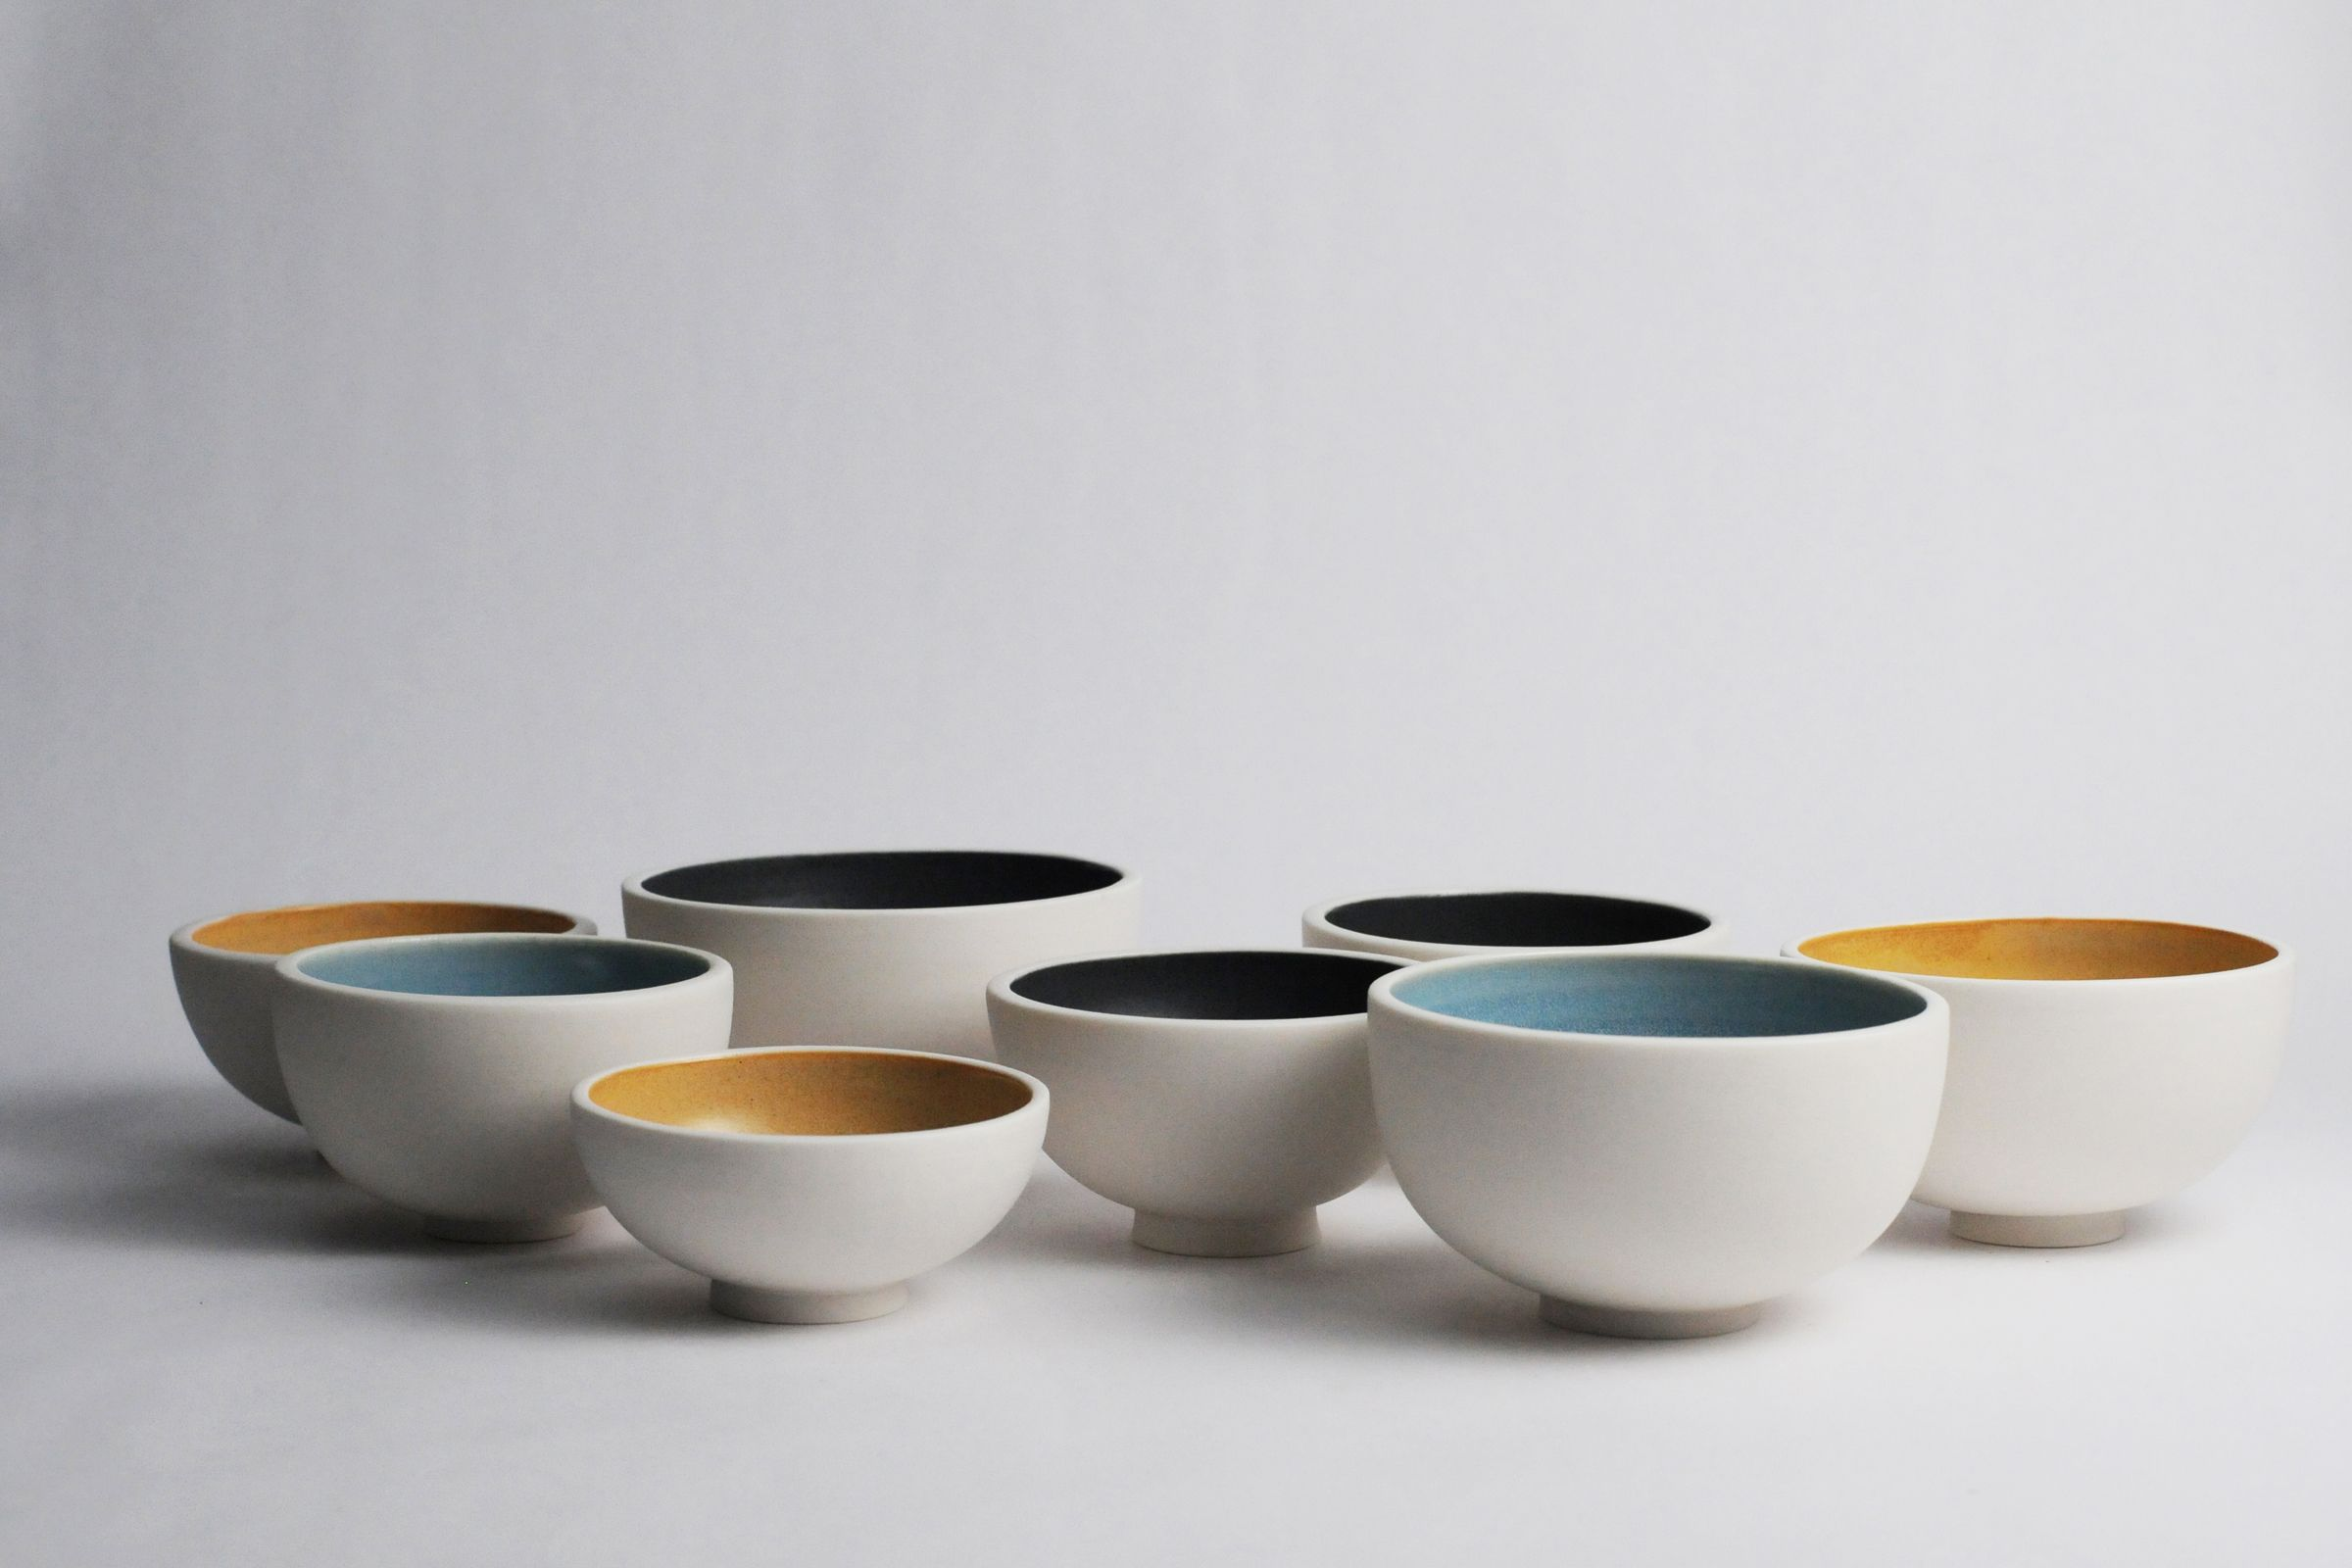 Bowl Sround Frost Multi2 Jpg With Images Small Bowls Porcelain Porcelain Art